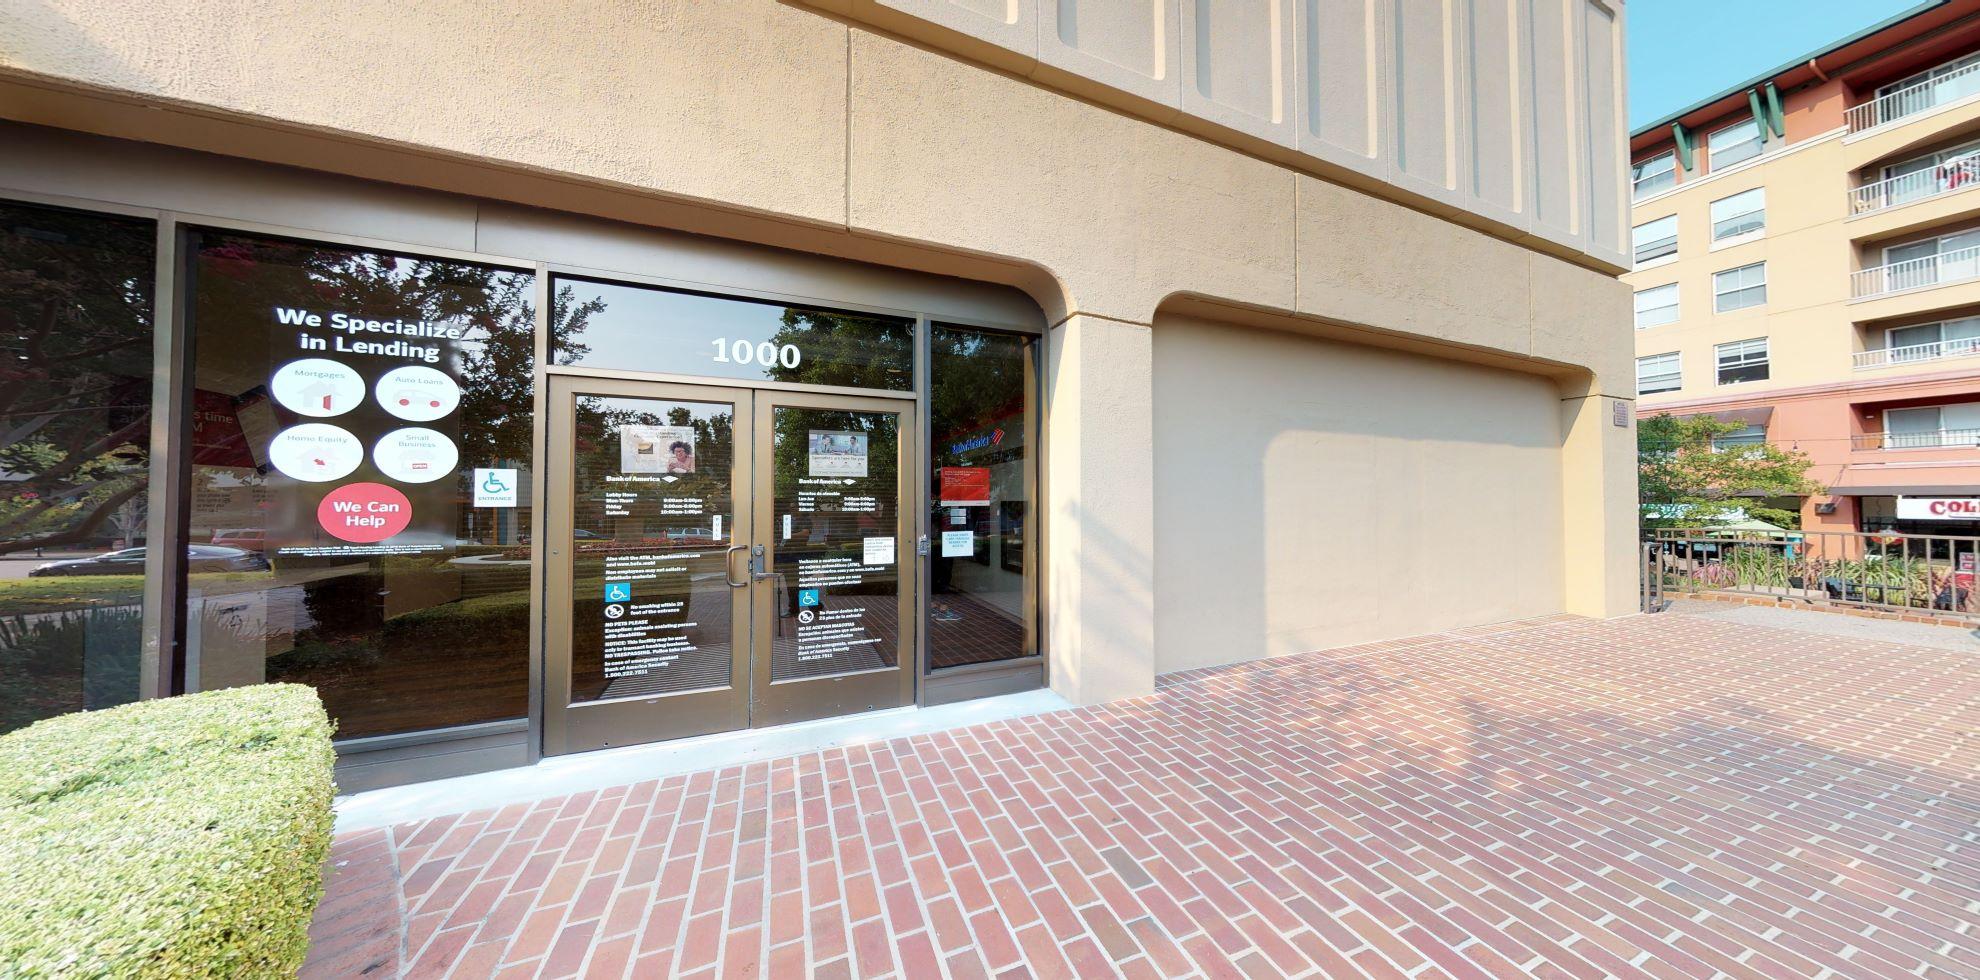 Bank of America financial center with drive-thru ATM | 1000 4th St, San Rafael, CA 94901